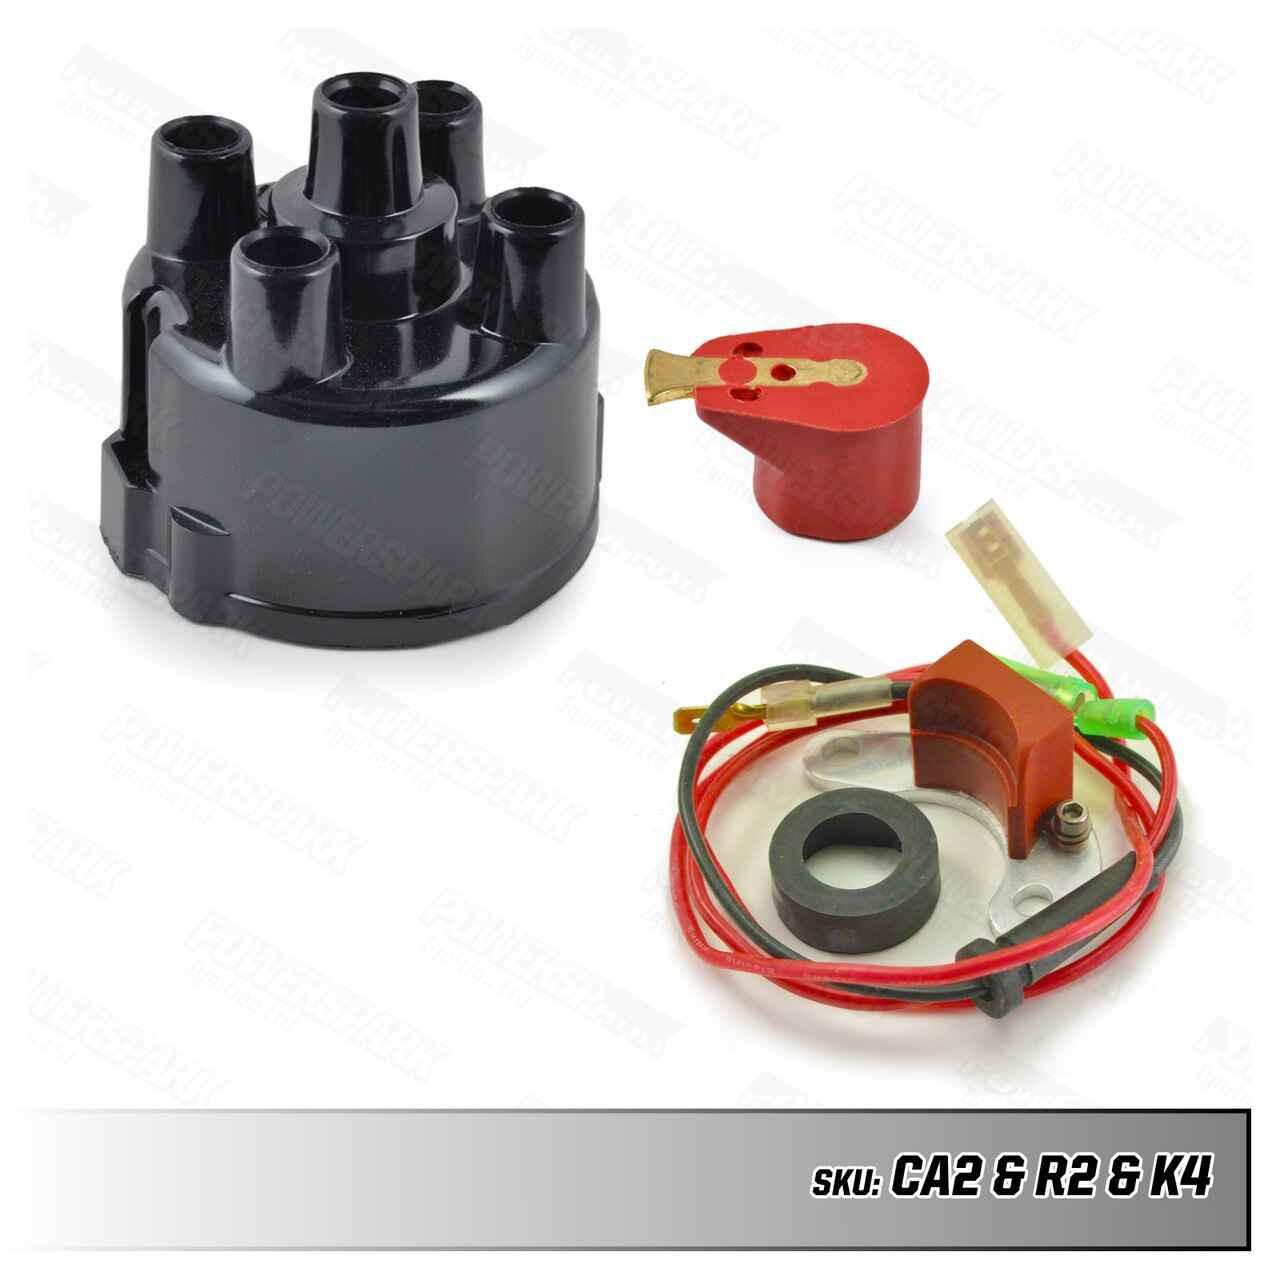 Lucas Lucas 45D Electronic Ignition Distributor Upgrade Kit